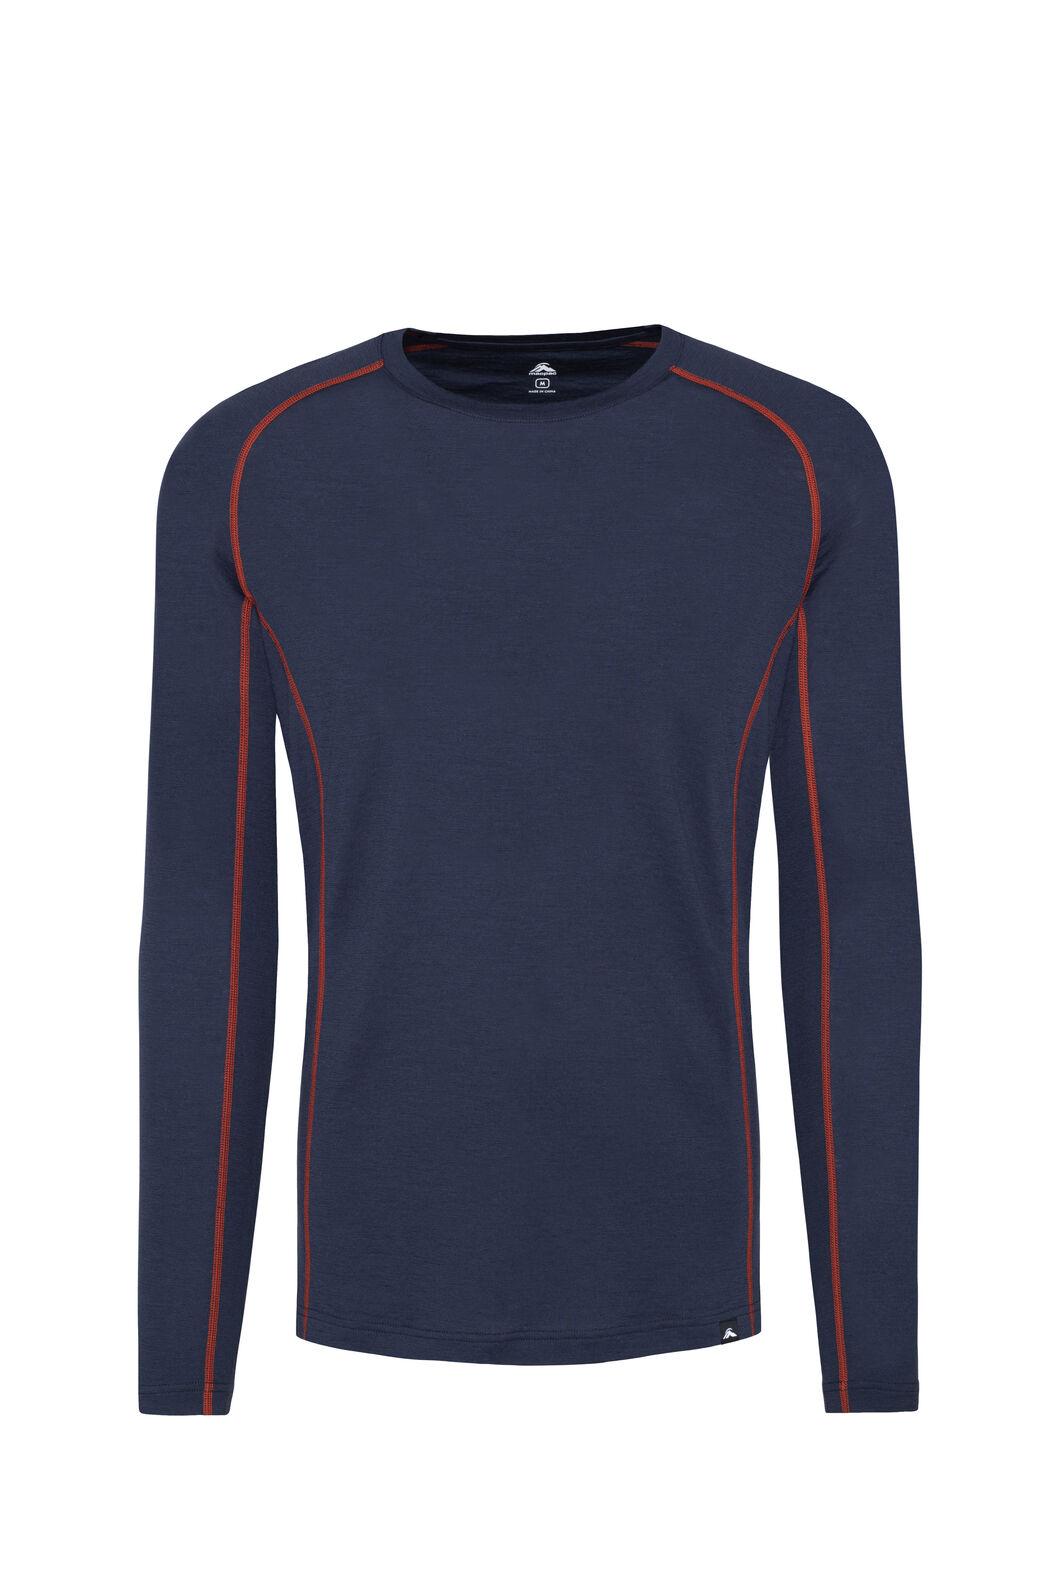 Macpac 150 Merino Long Sleeve Top — Men's, Black Iris/Rooibos Tea, hi-res